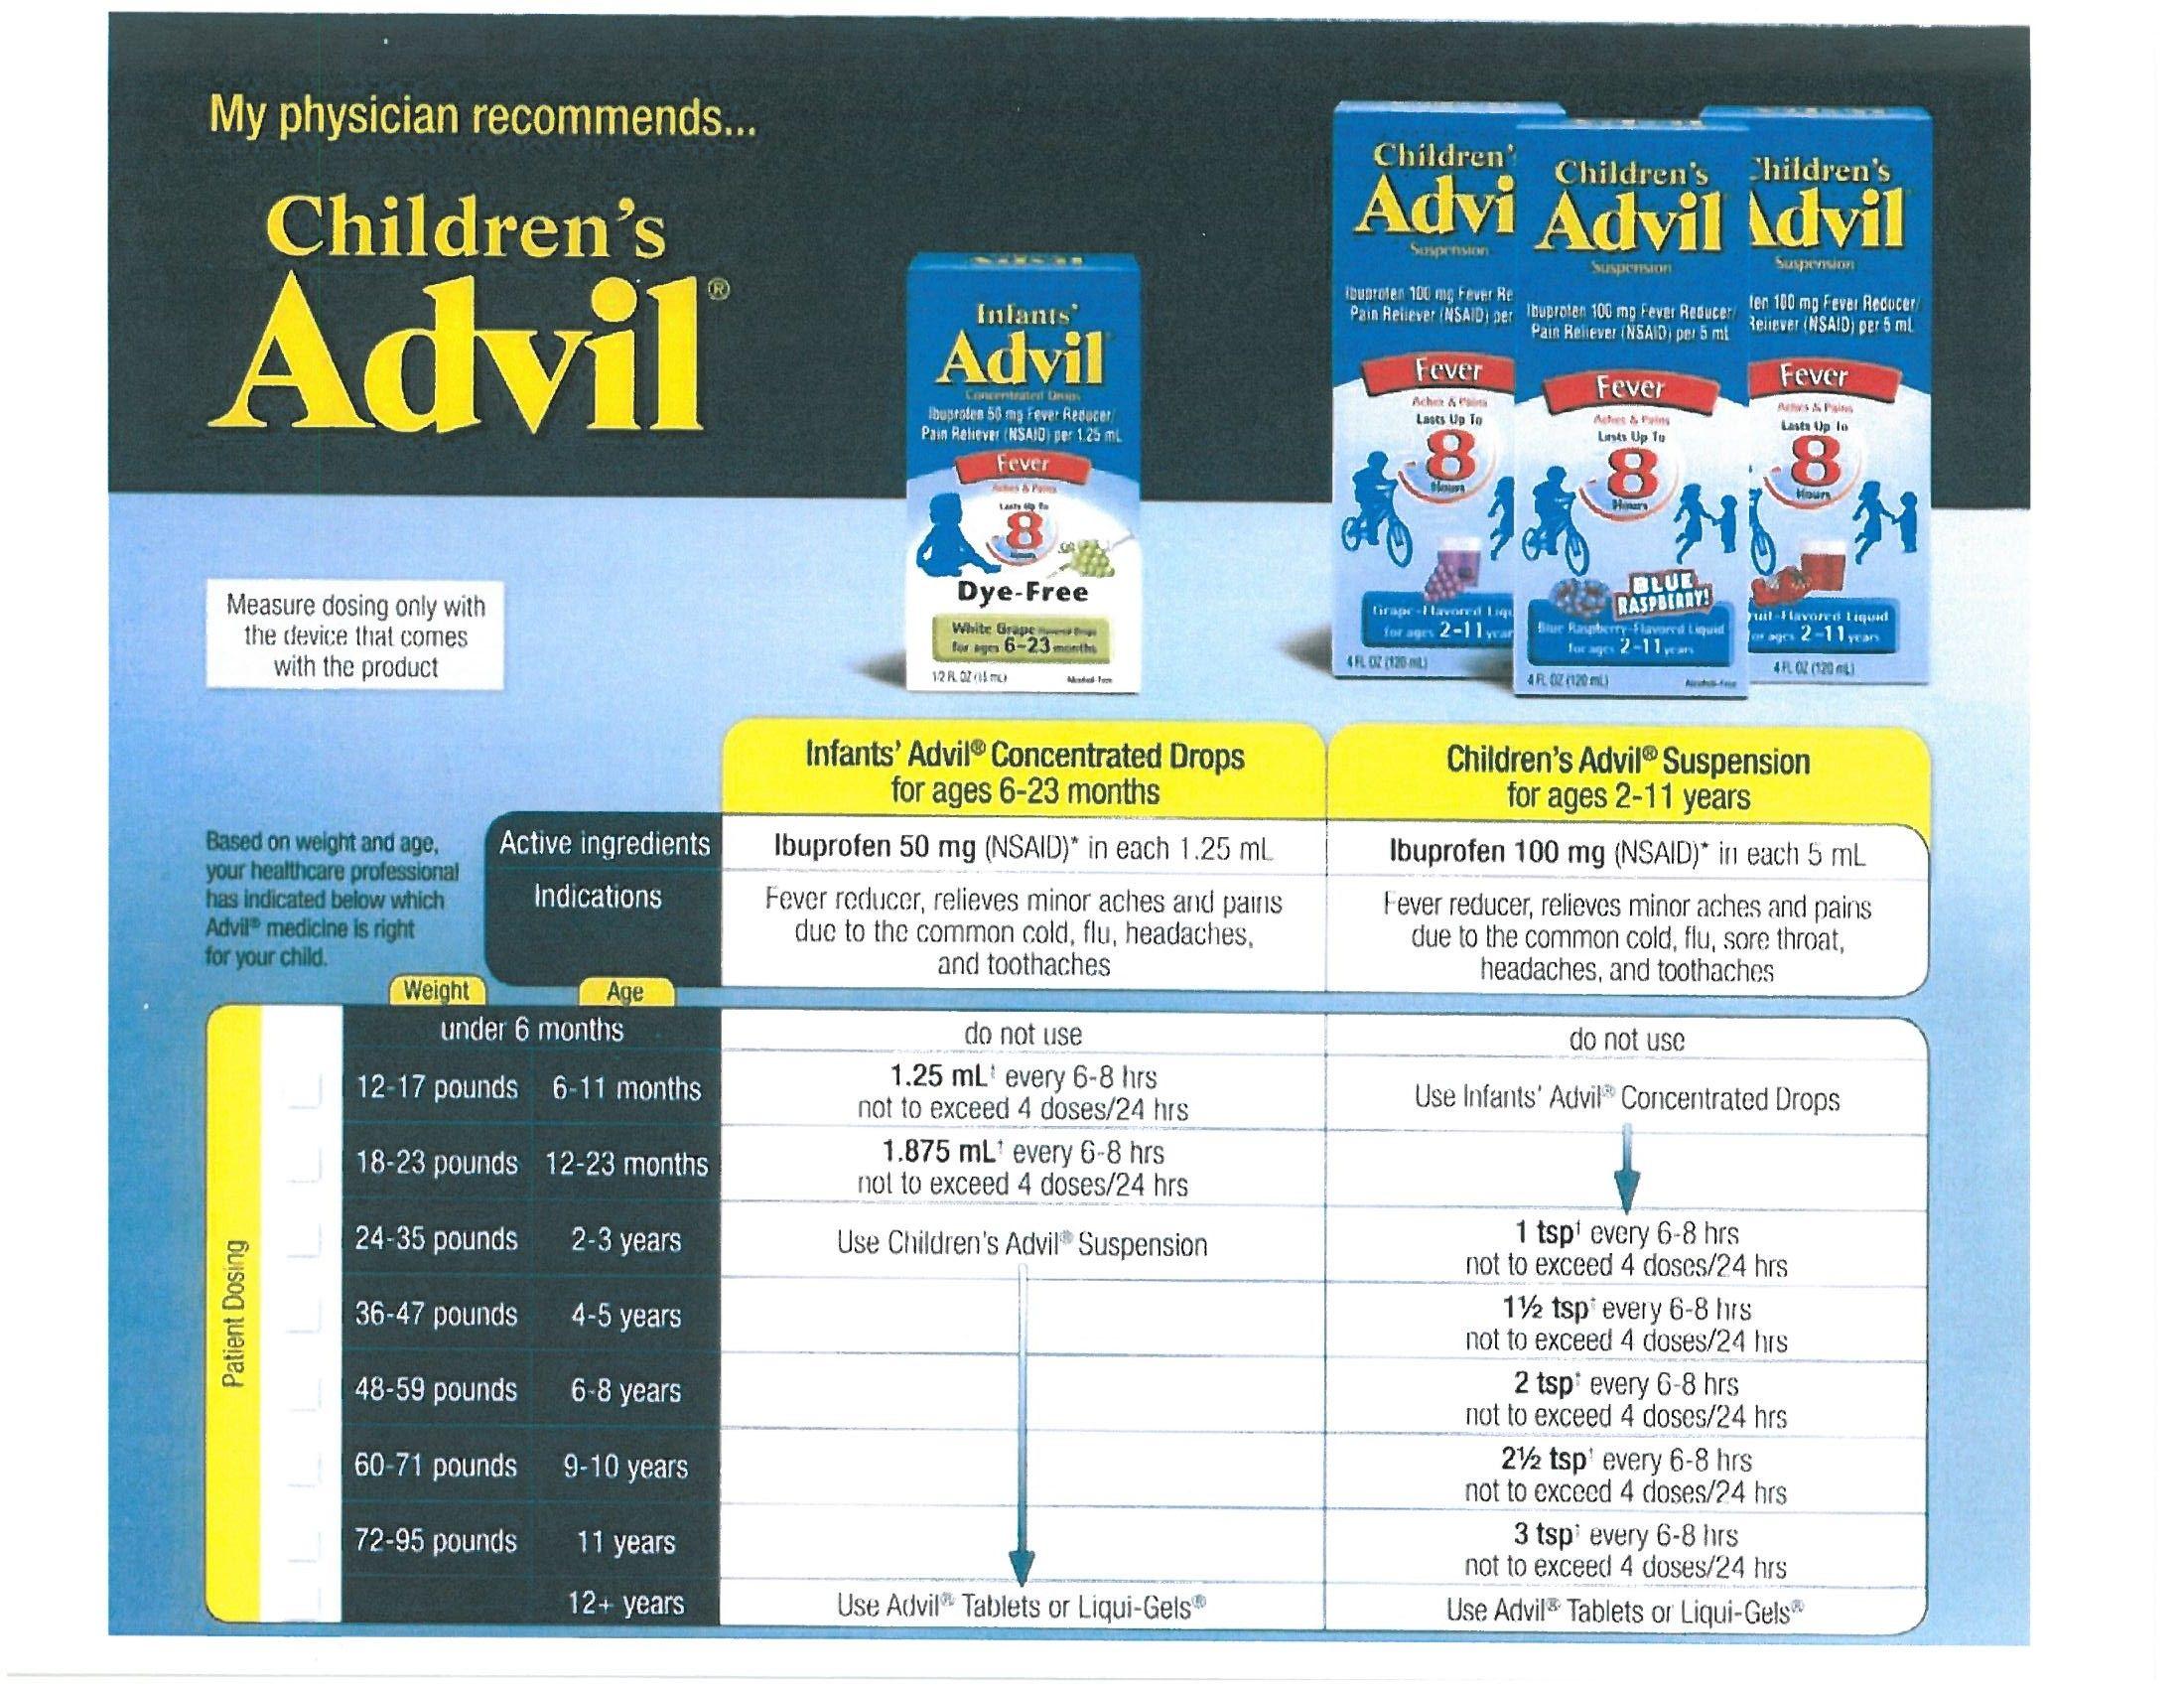 Advil ibuprofen dosage information infant and children   also health rh pinterest